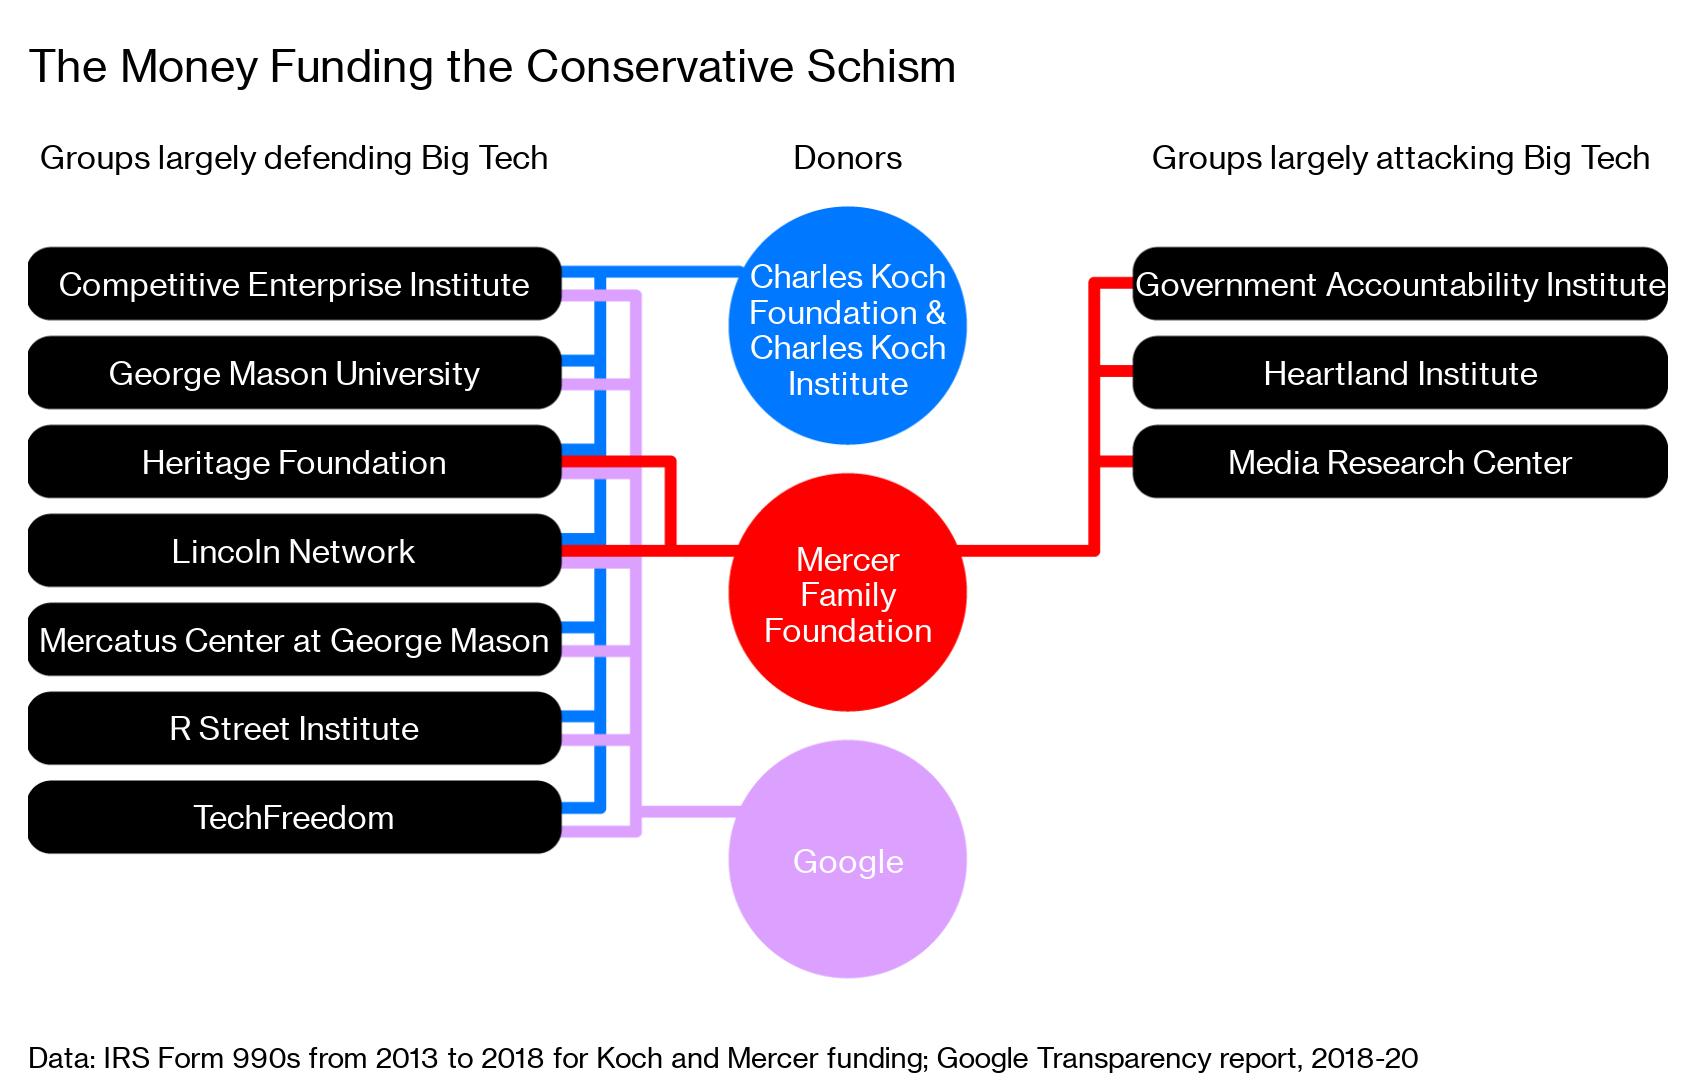 It's Kochs vs. Mercers in the Right's Big Tech Brawl